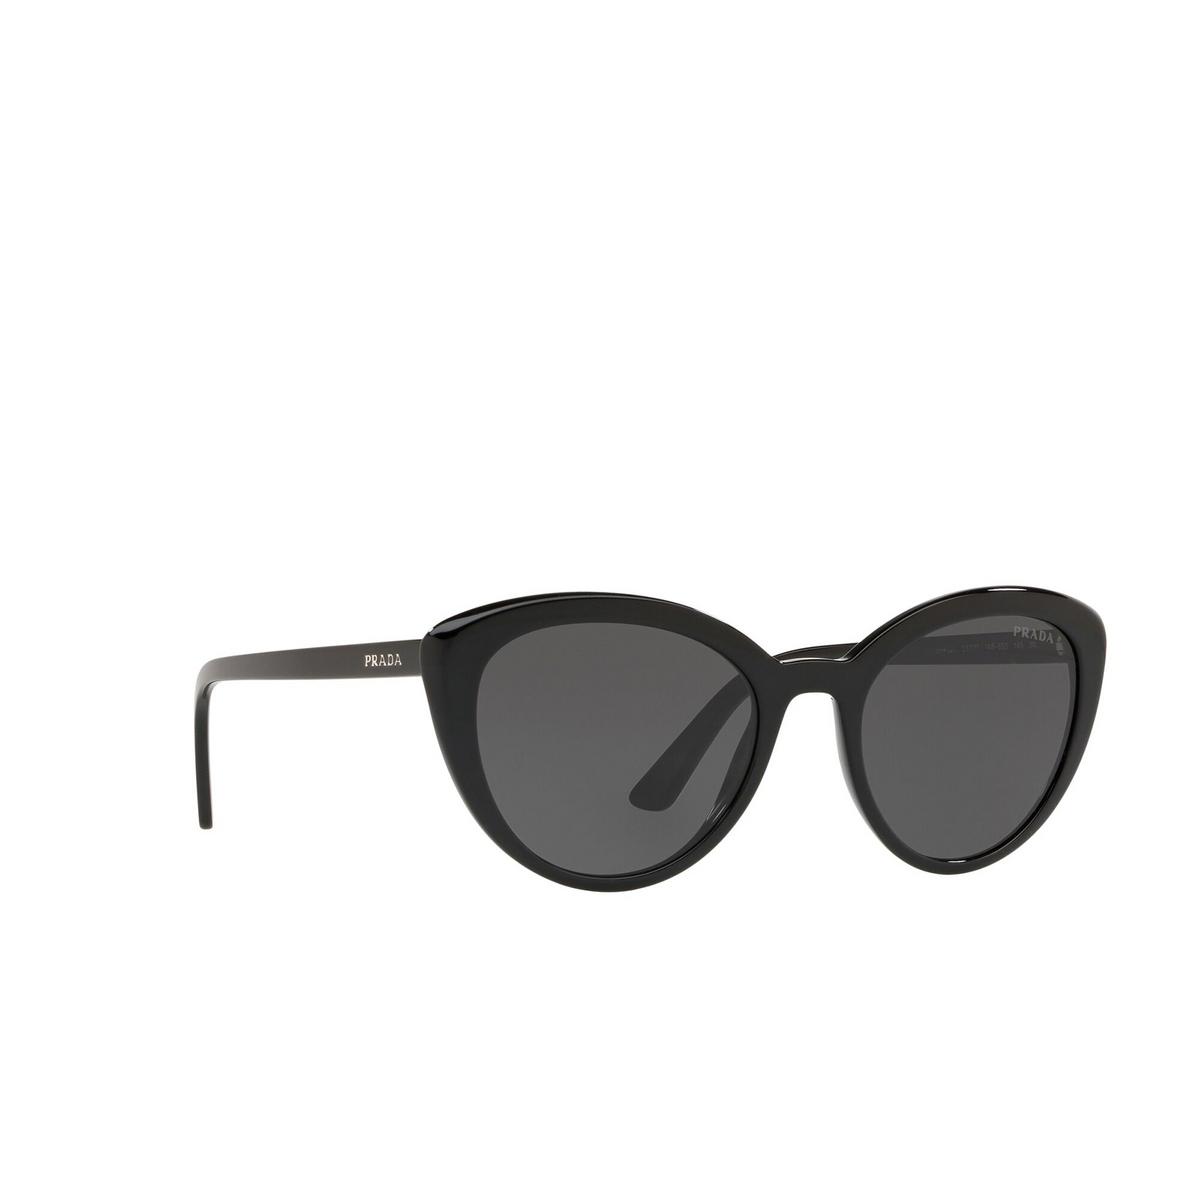 Prada® Cat-eye Sunglasses: Conceptual PR 02VSF color Black 1AB5S0 - three-quarters view.